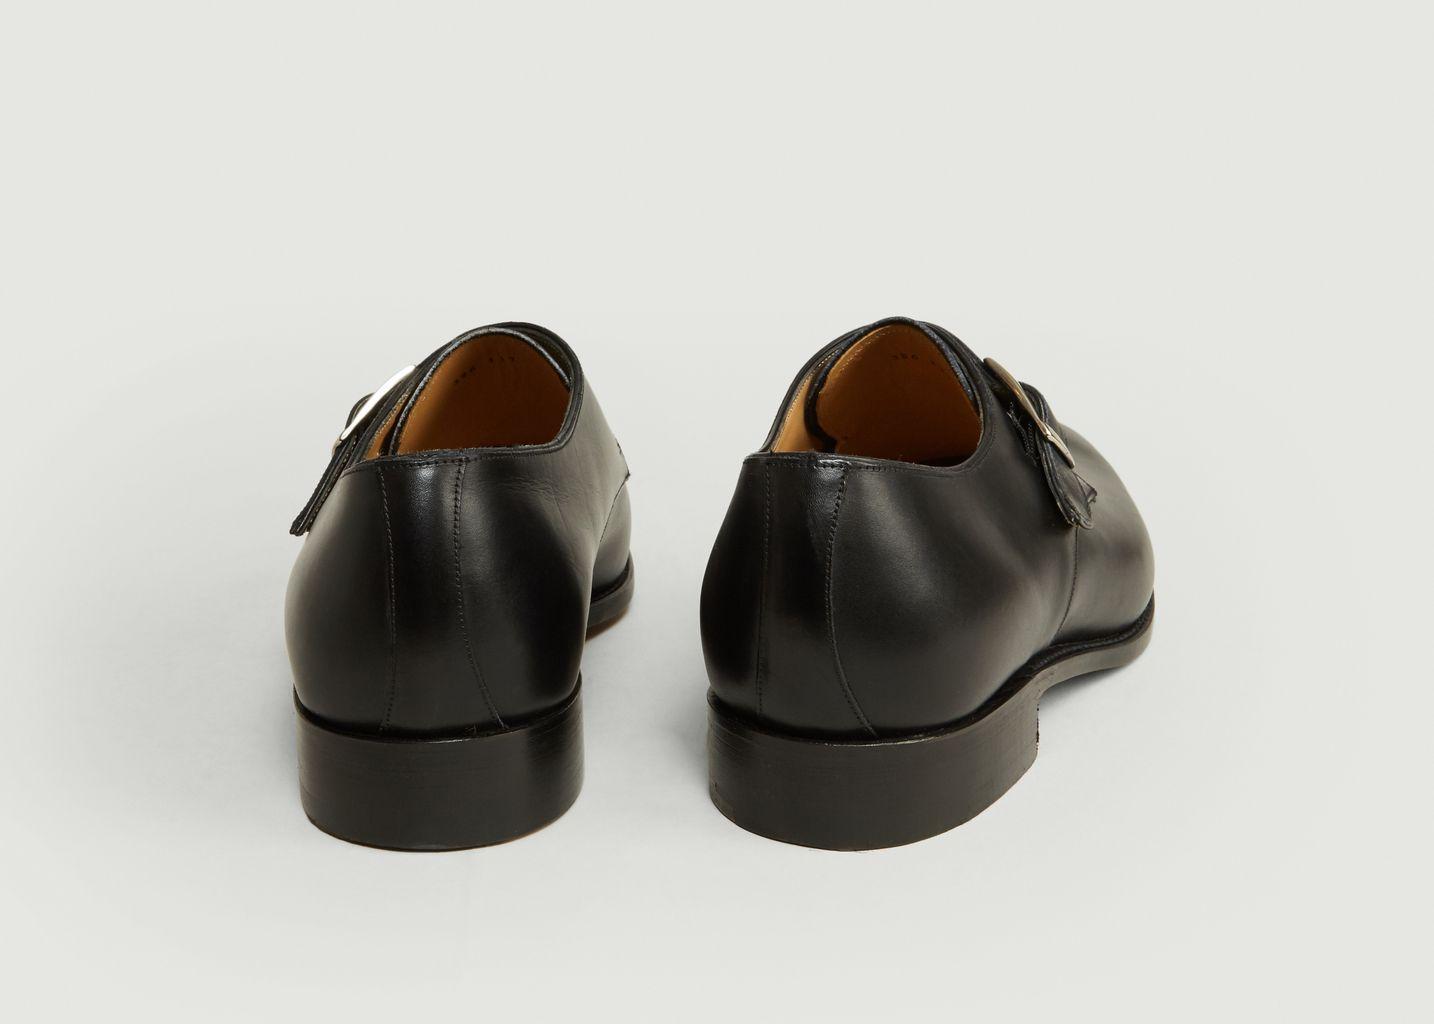 Northcote Derbies - Barker Shoes